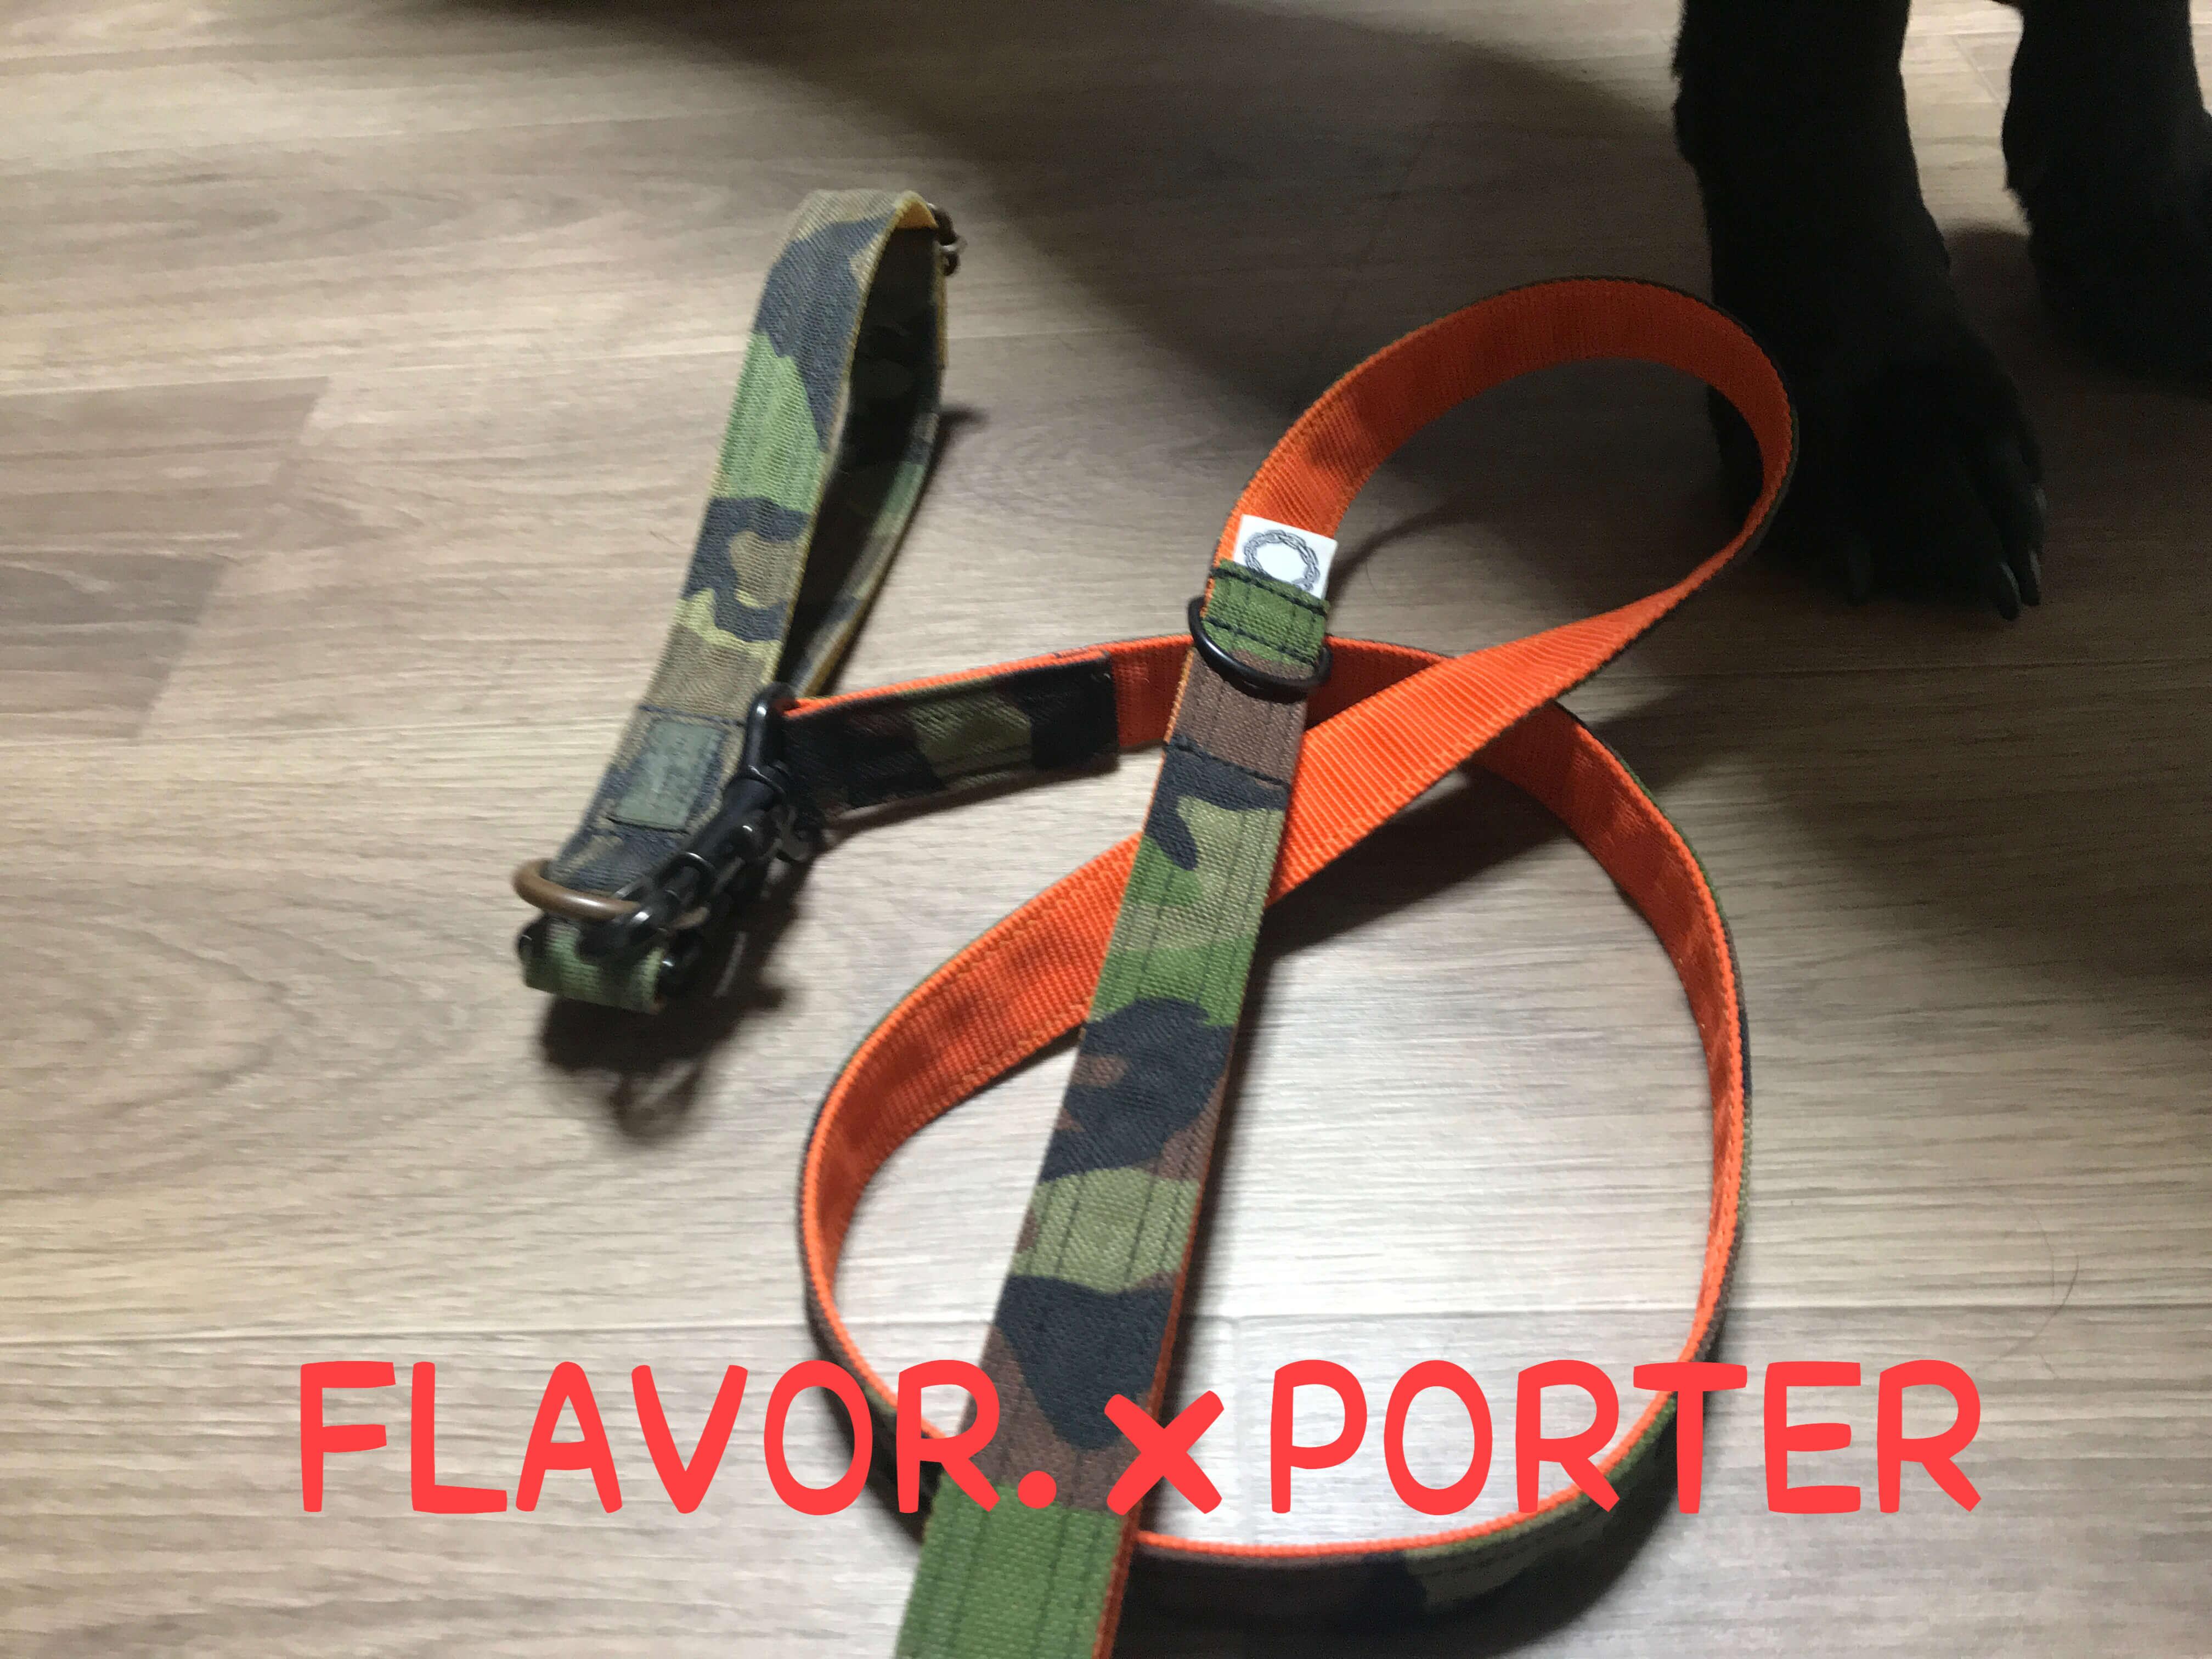 FLAVOR.×PORTER リードと首輪